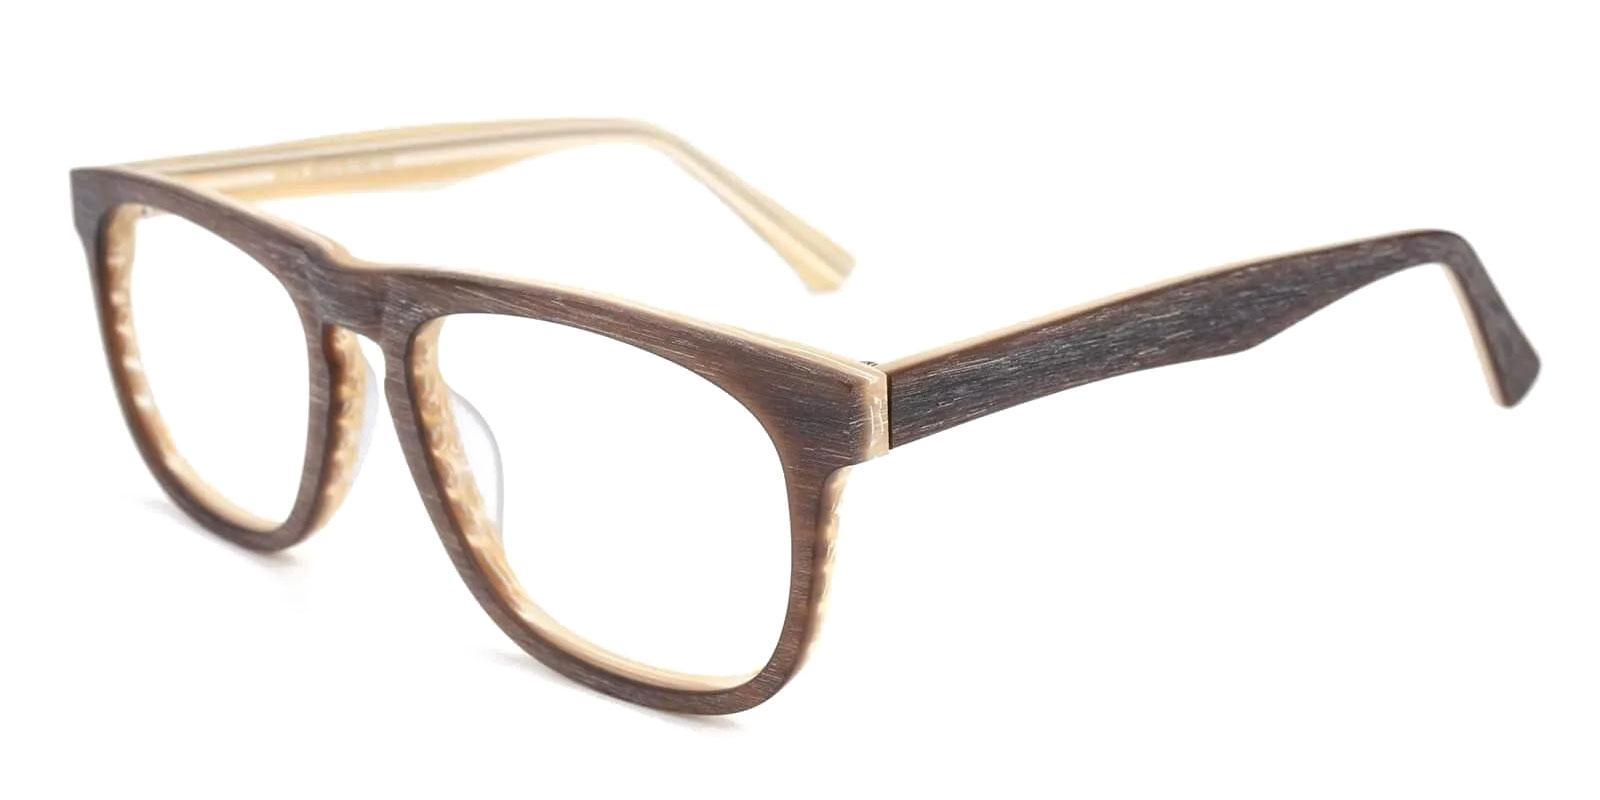 Readsboro Striped Acetate Eyeglasses , UniversalBridgeFit Frames from ABBE Glasses